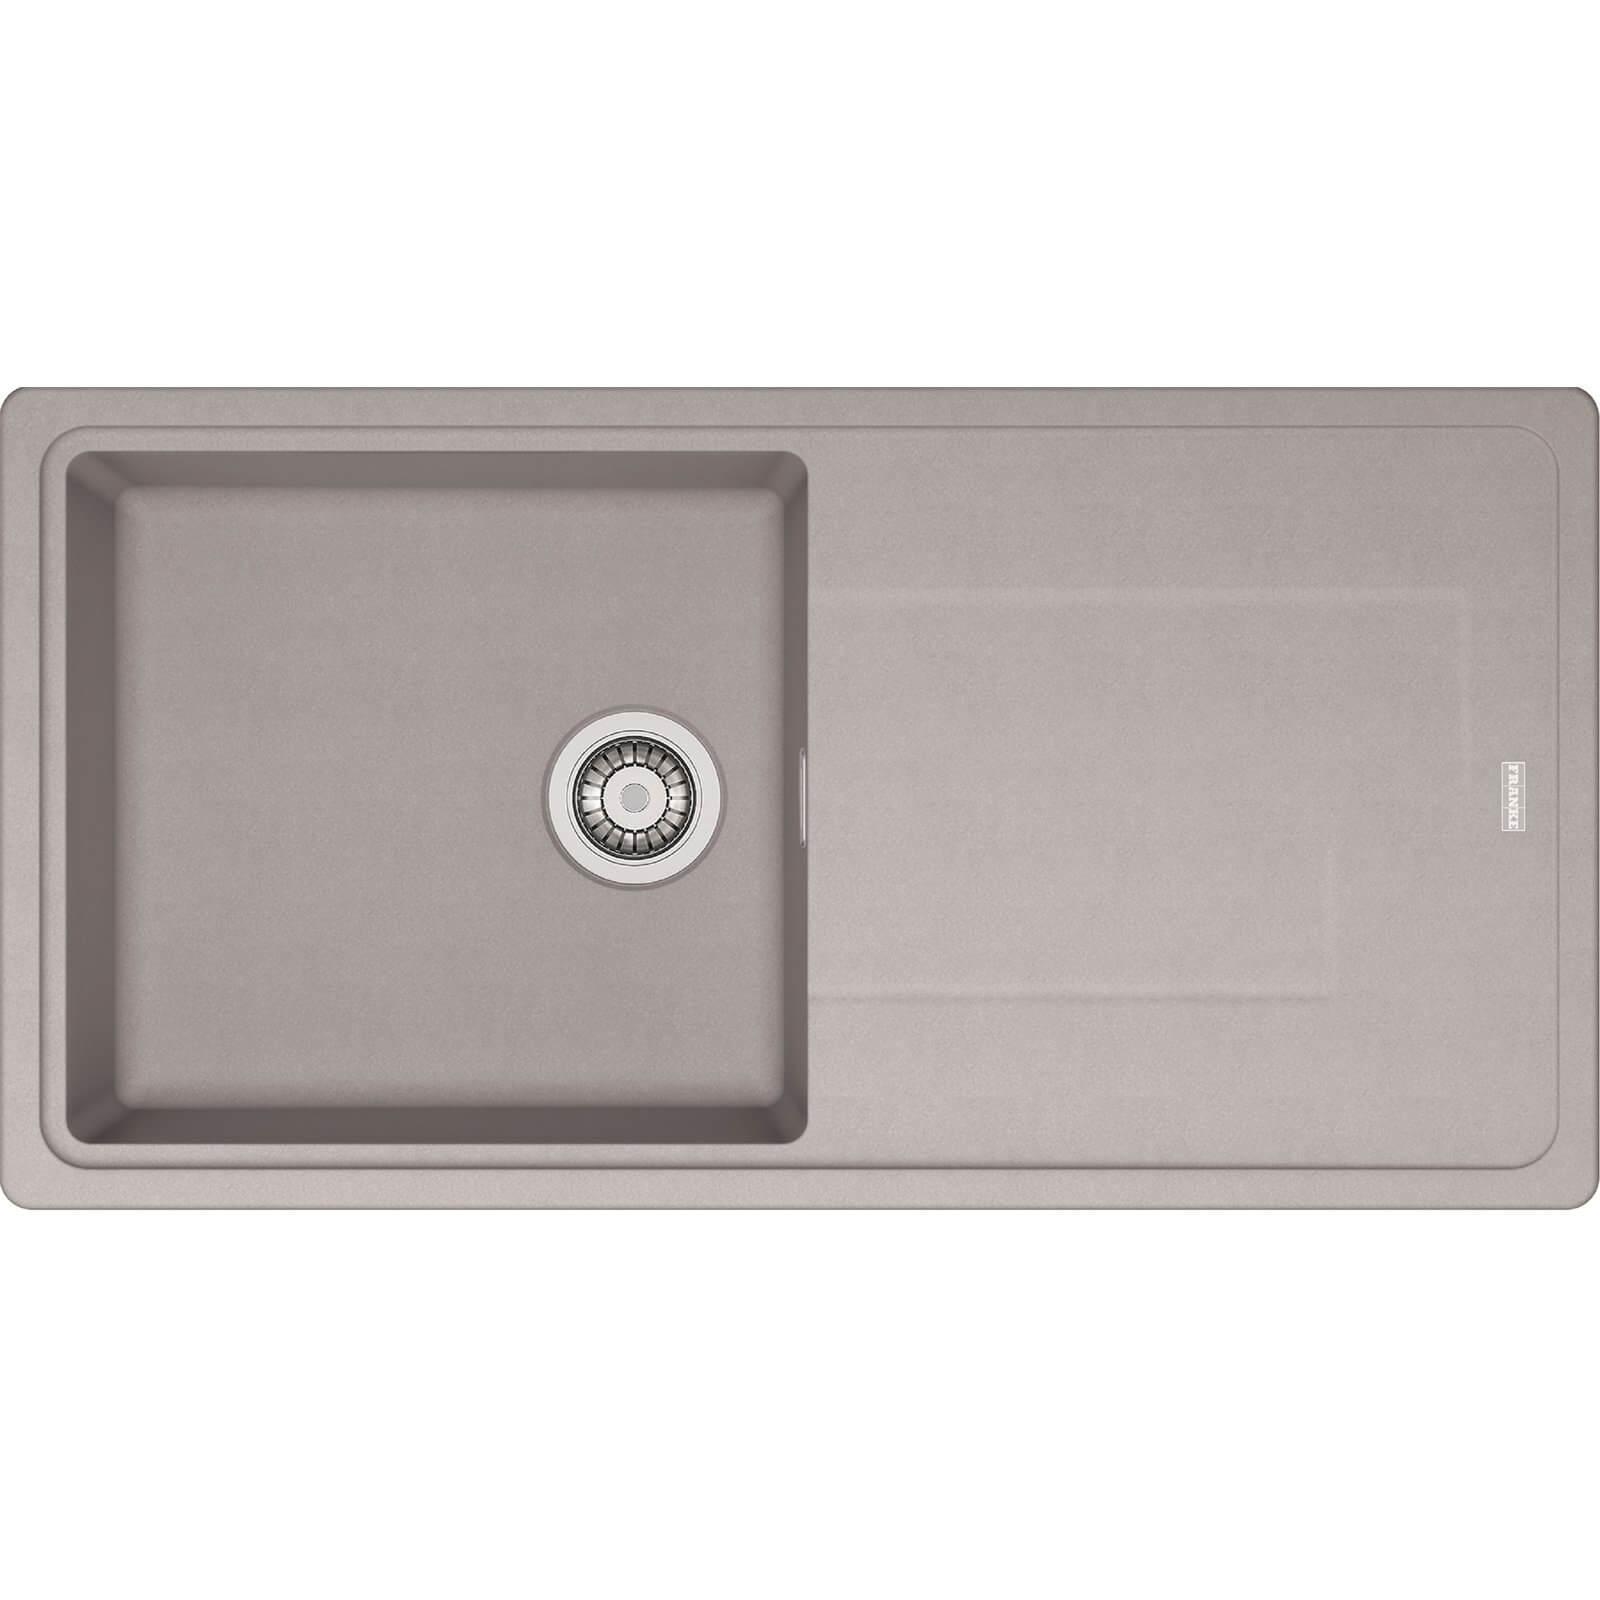 Franke Gemini Grey Reversible Kitchen Sink - 1 Bowl